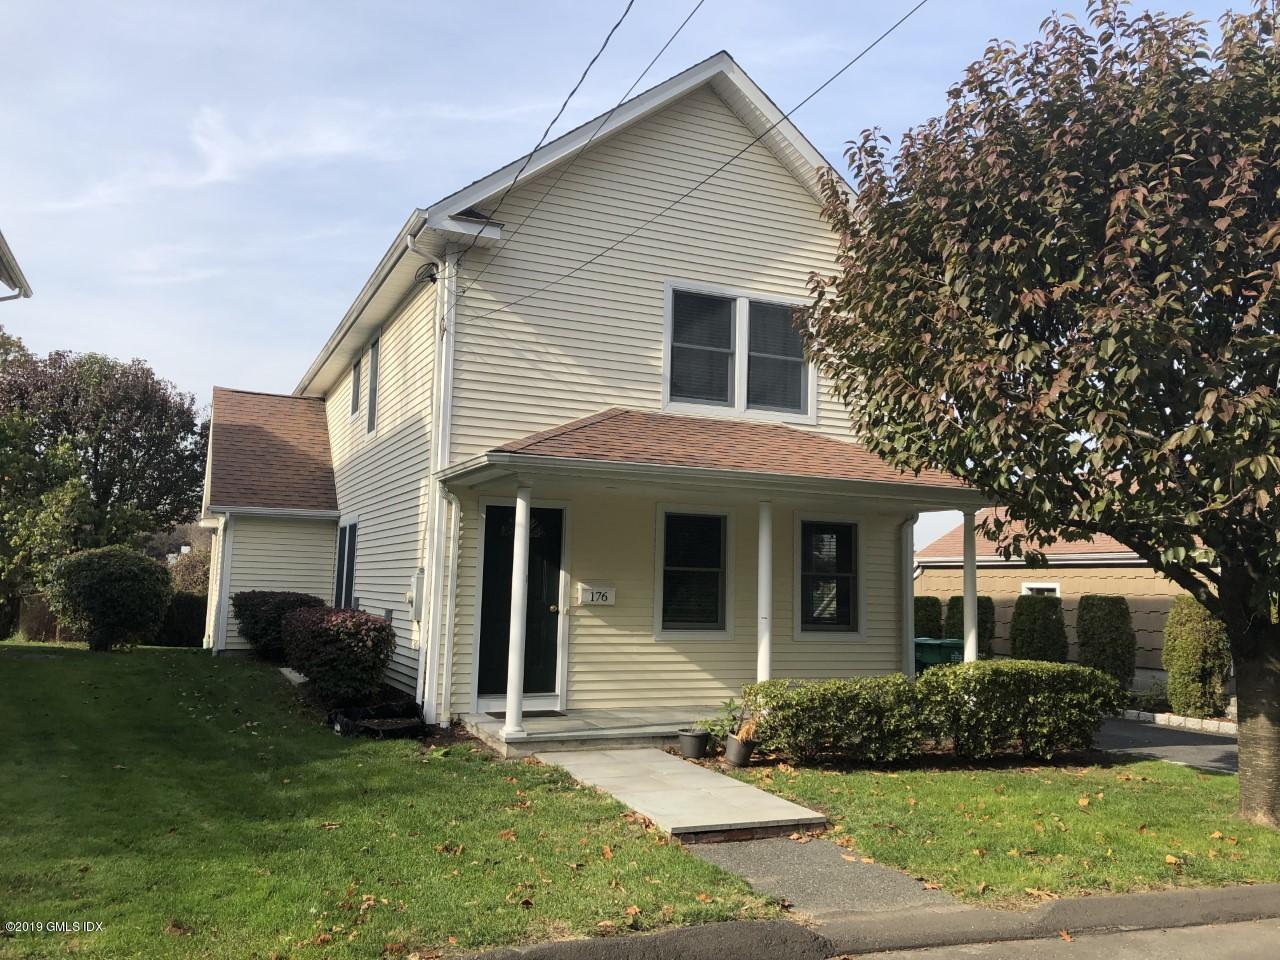 176 Peck Avenue,Greenwich,Connecticut 06830,3 Bedrooms Bedrooms,2 BathroomsBathrooms,Single family,Peck,108323